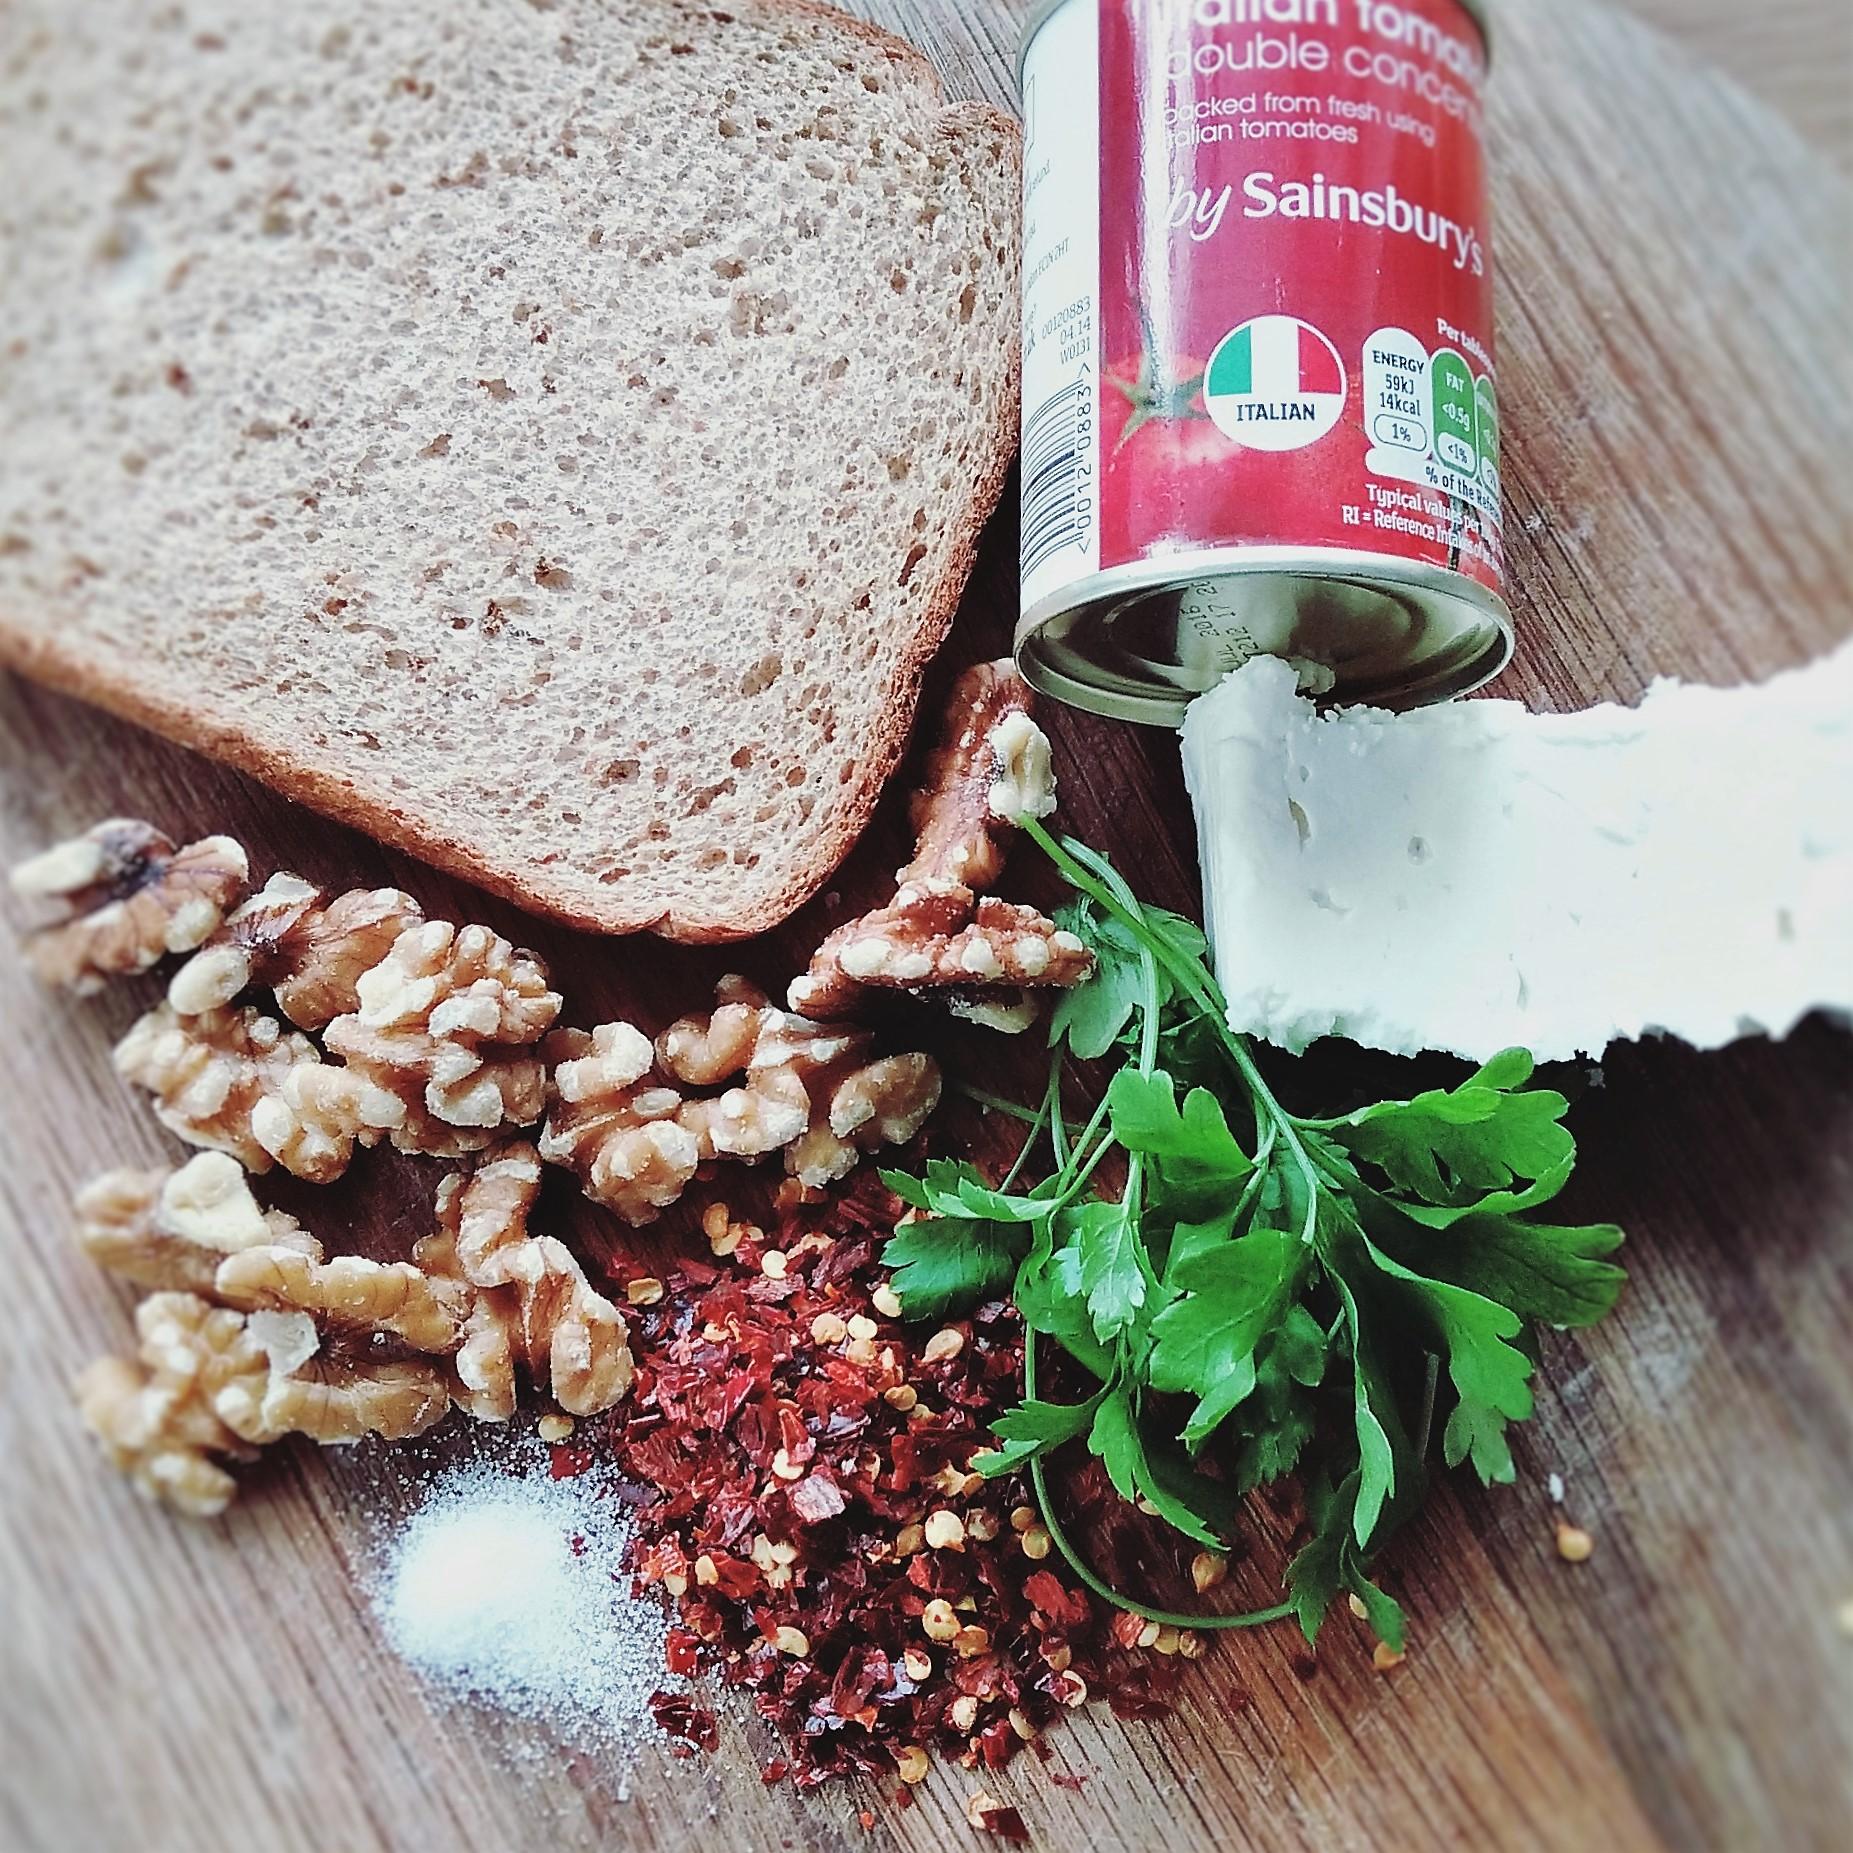 Feta and walnut pate